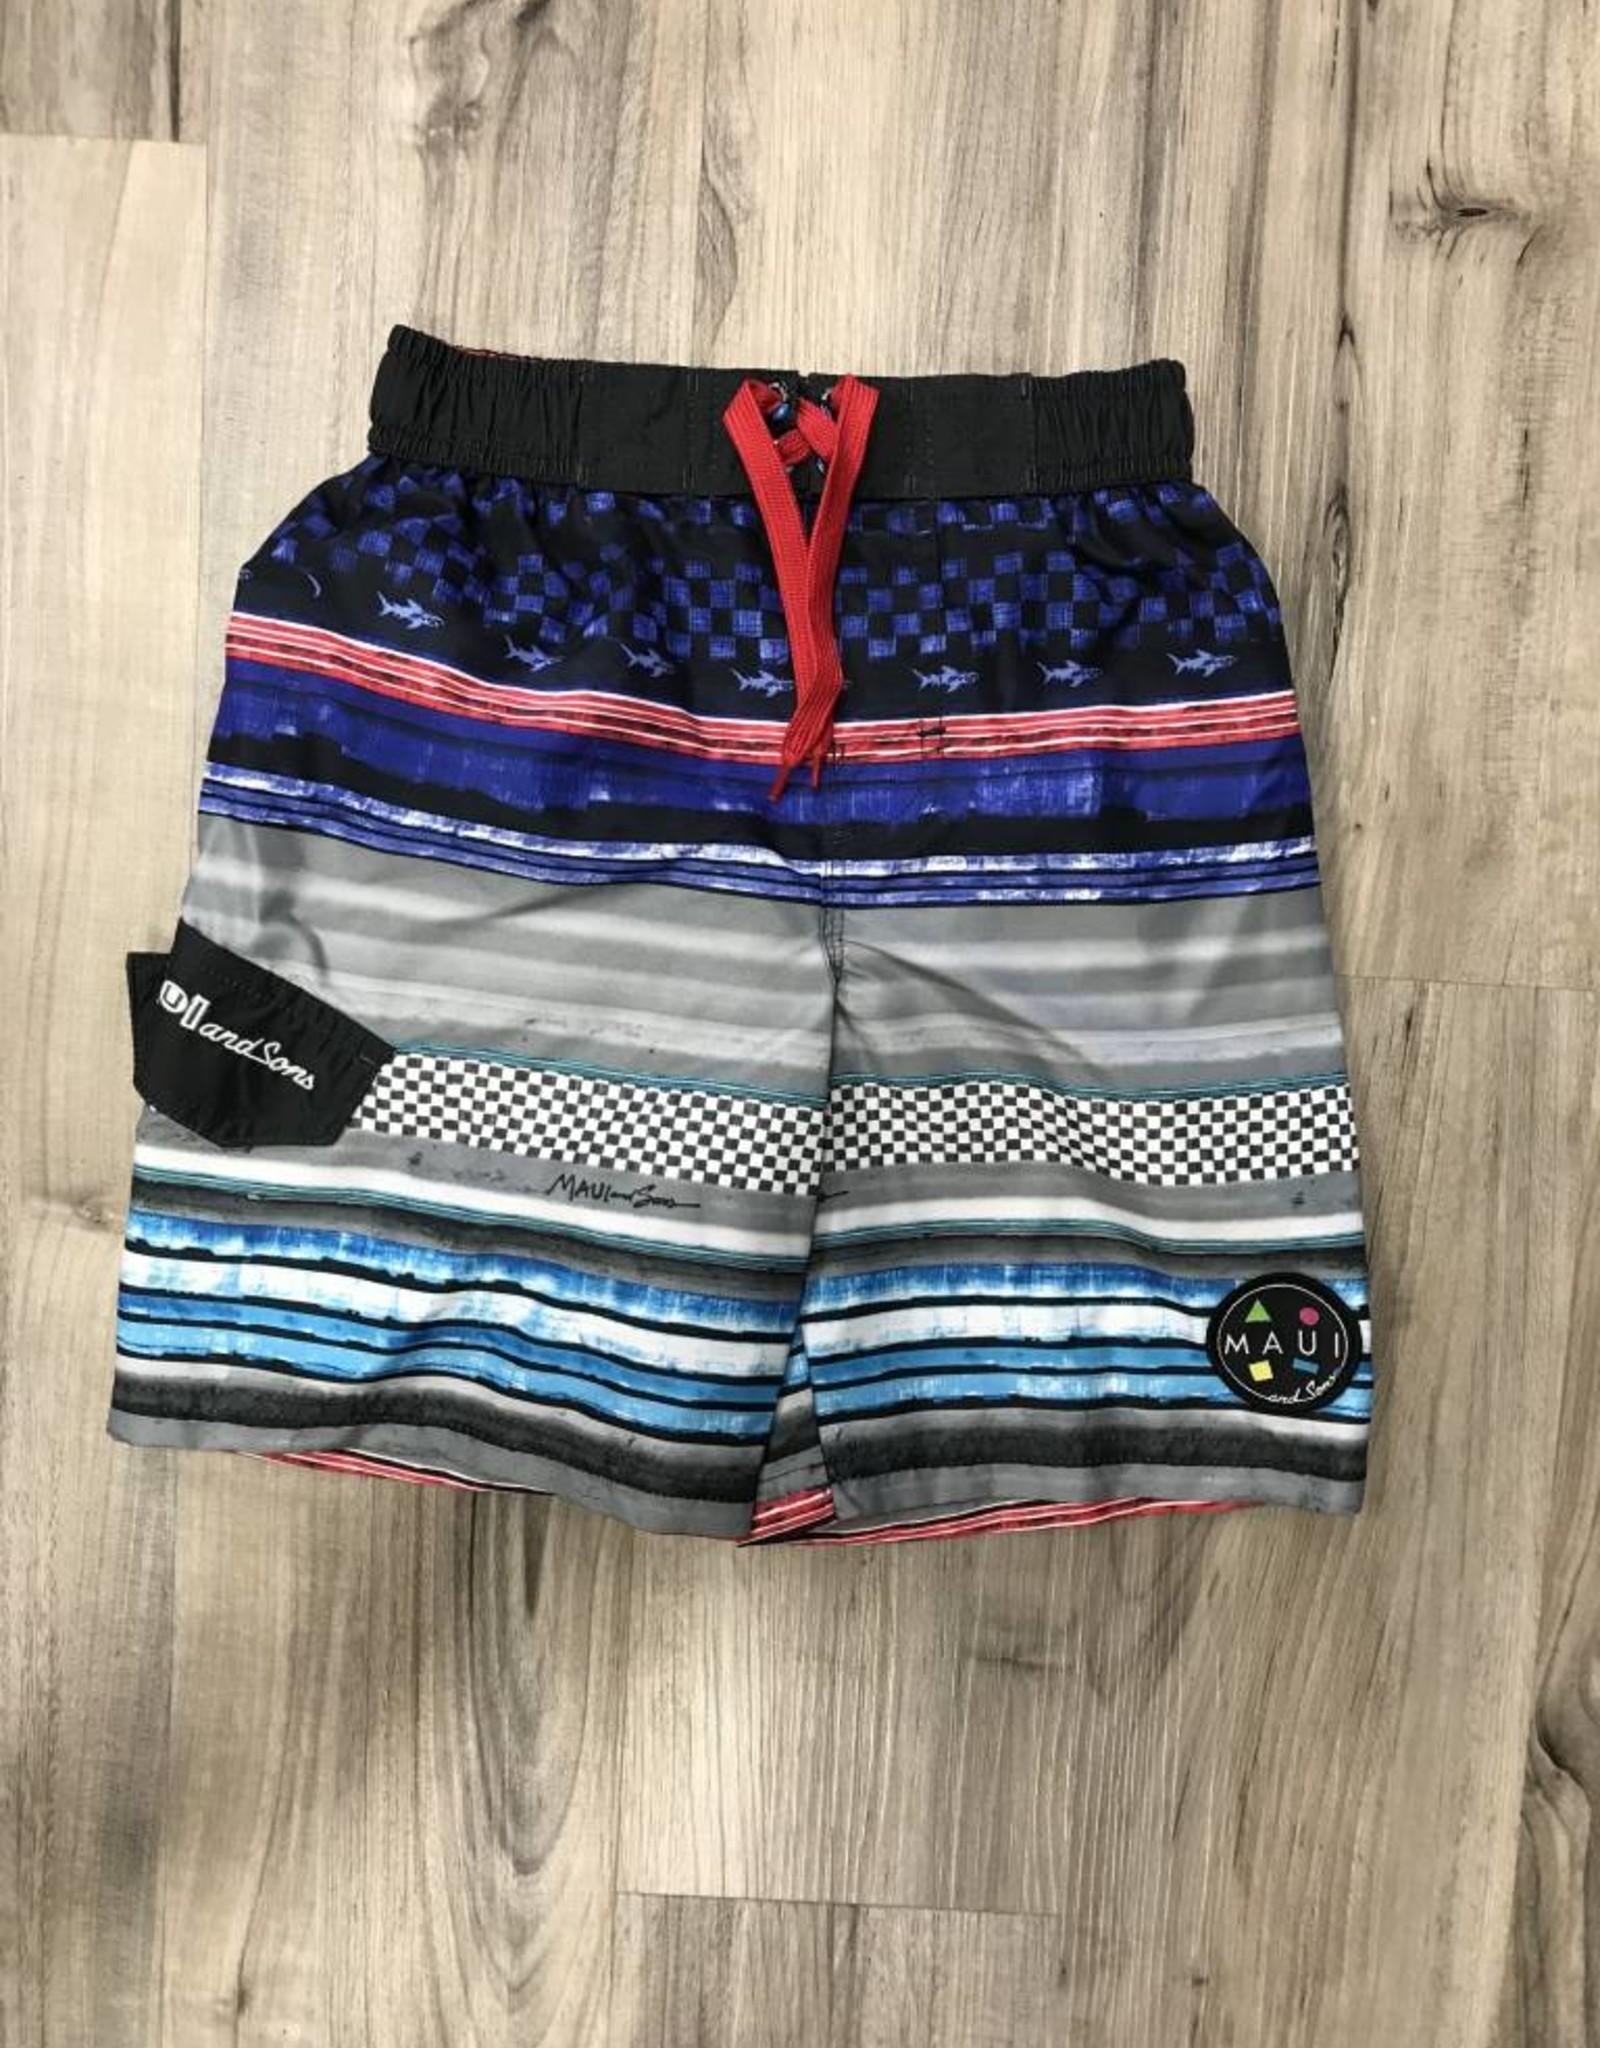 Maui Swim trunks